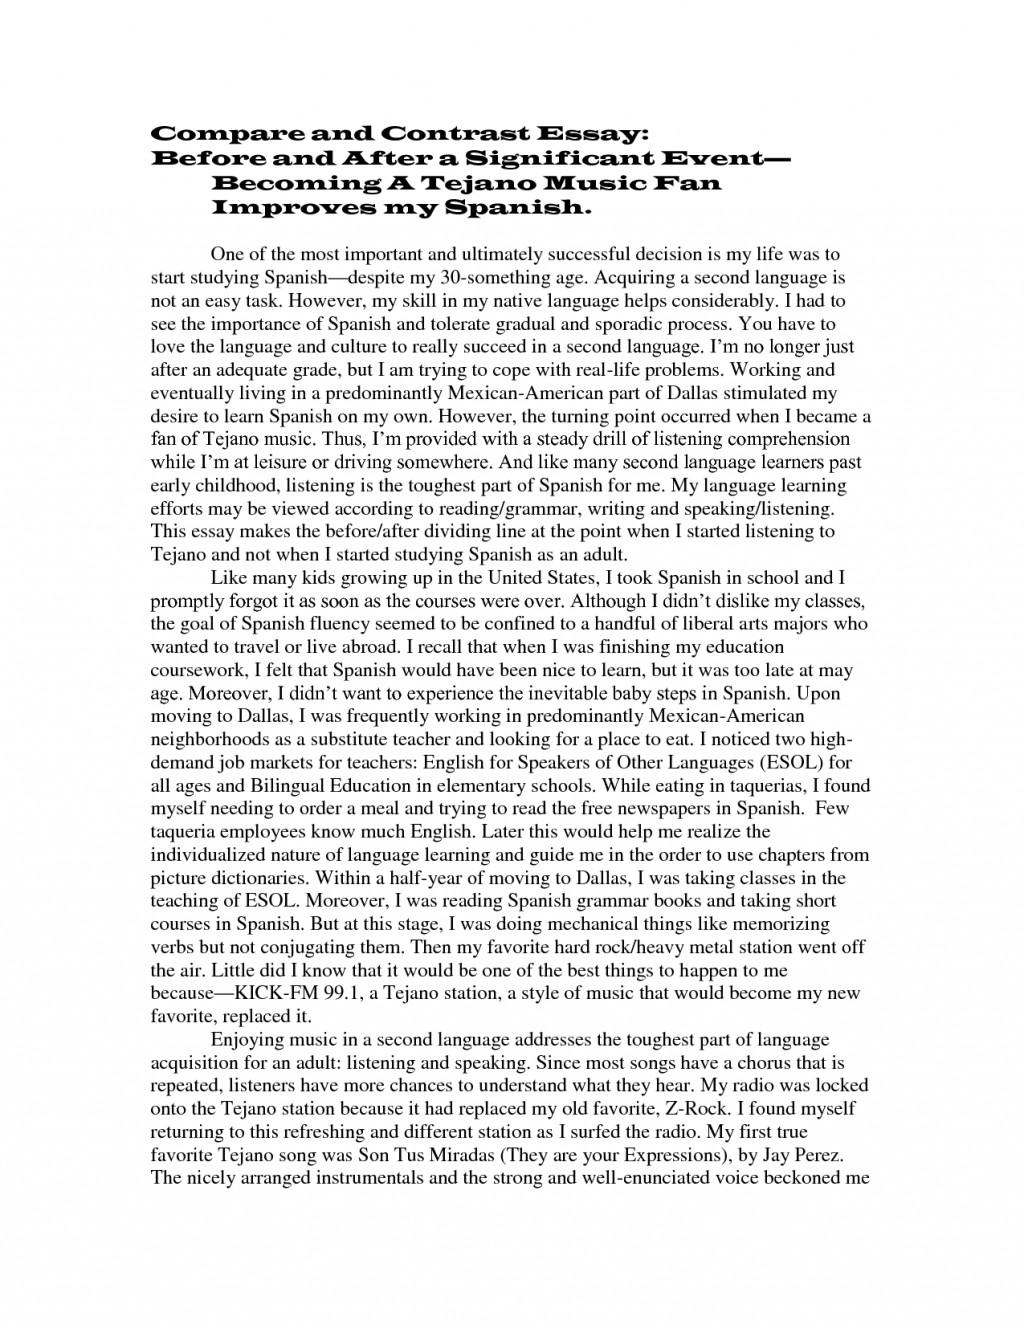 004 Compare Contrast Essays Unusual Essay Examples High School Vs College Comparison Pdf And Topics 6th Grade Large